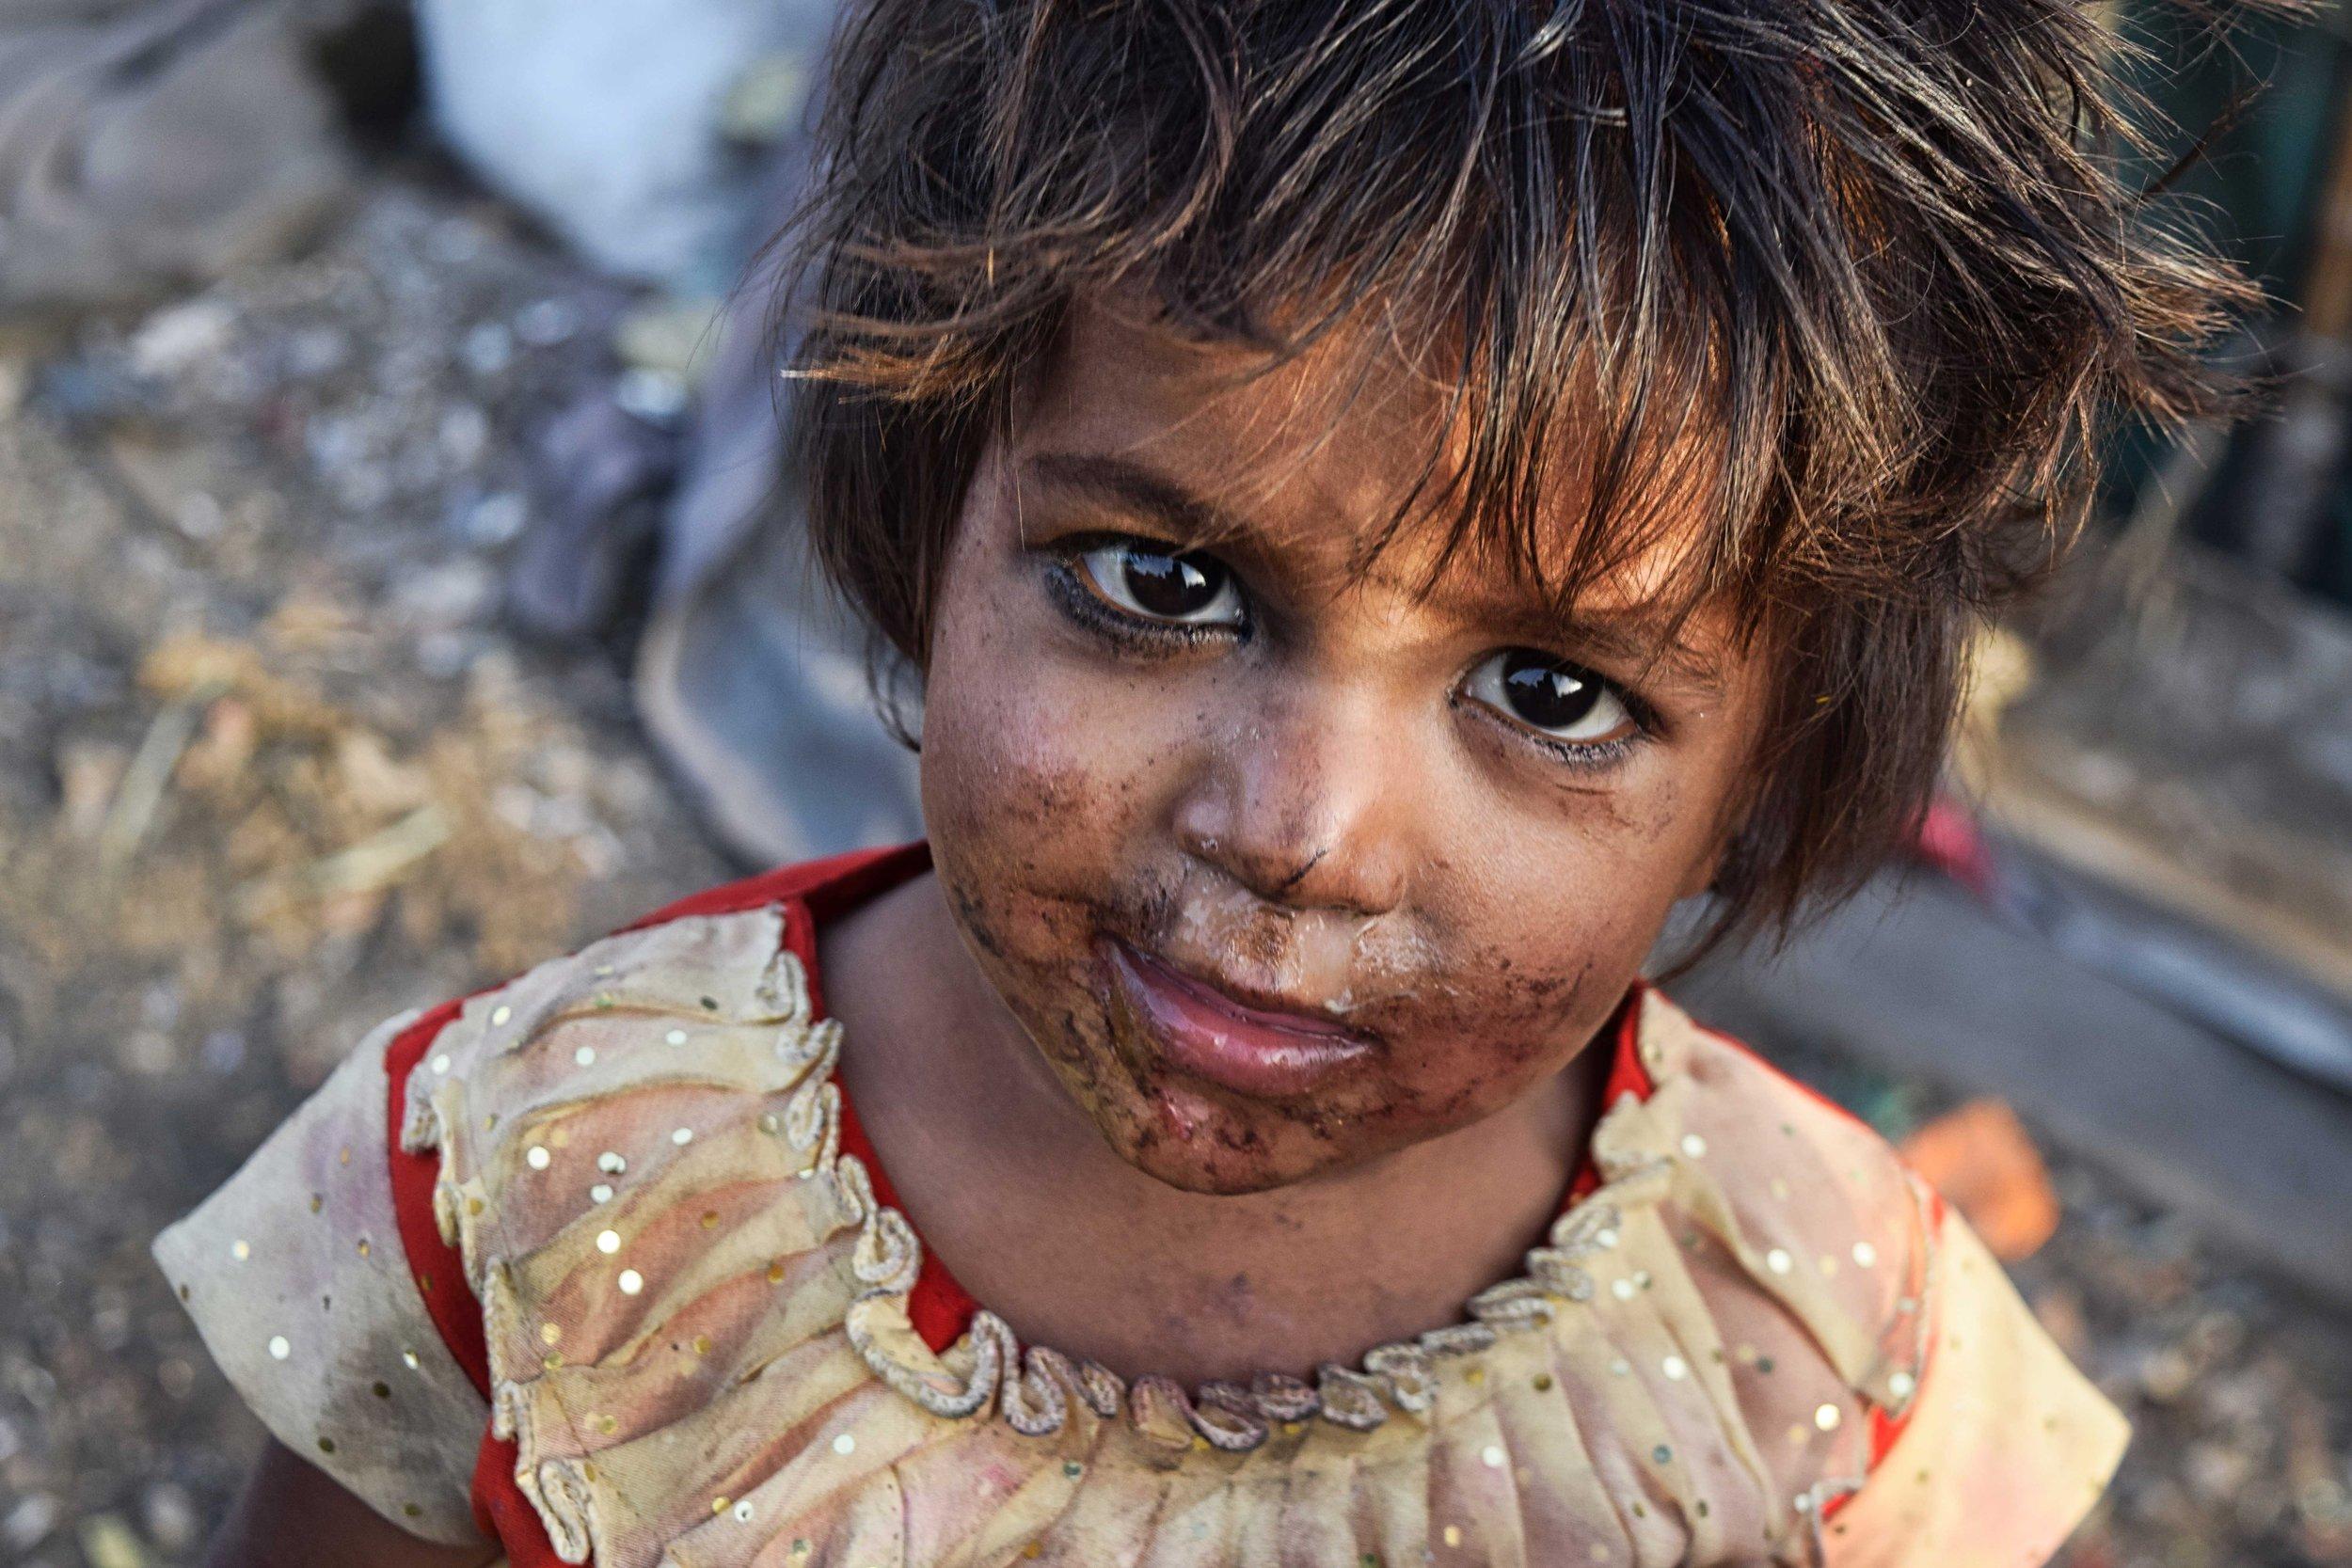 facepoverty-child2369766.jpg